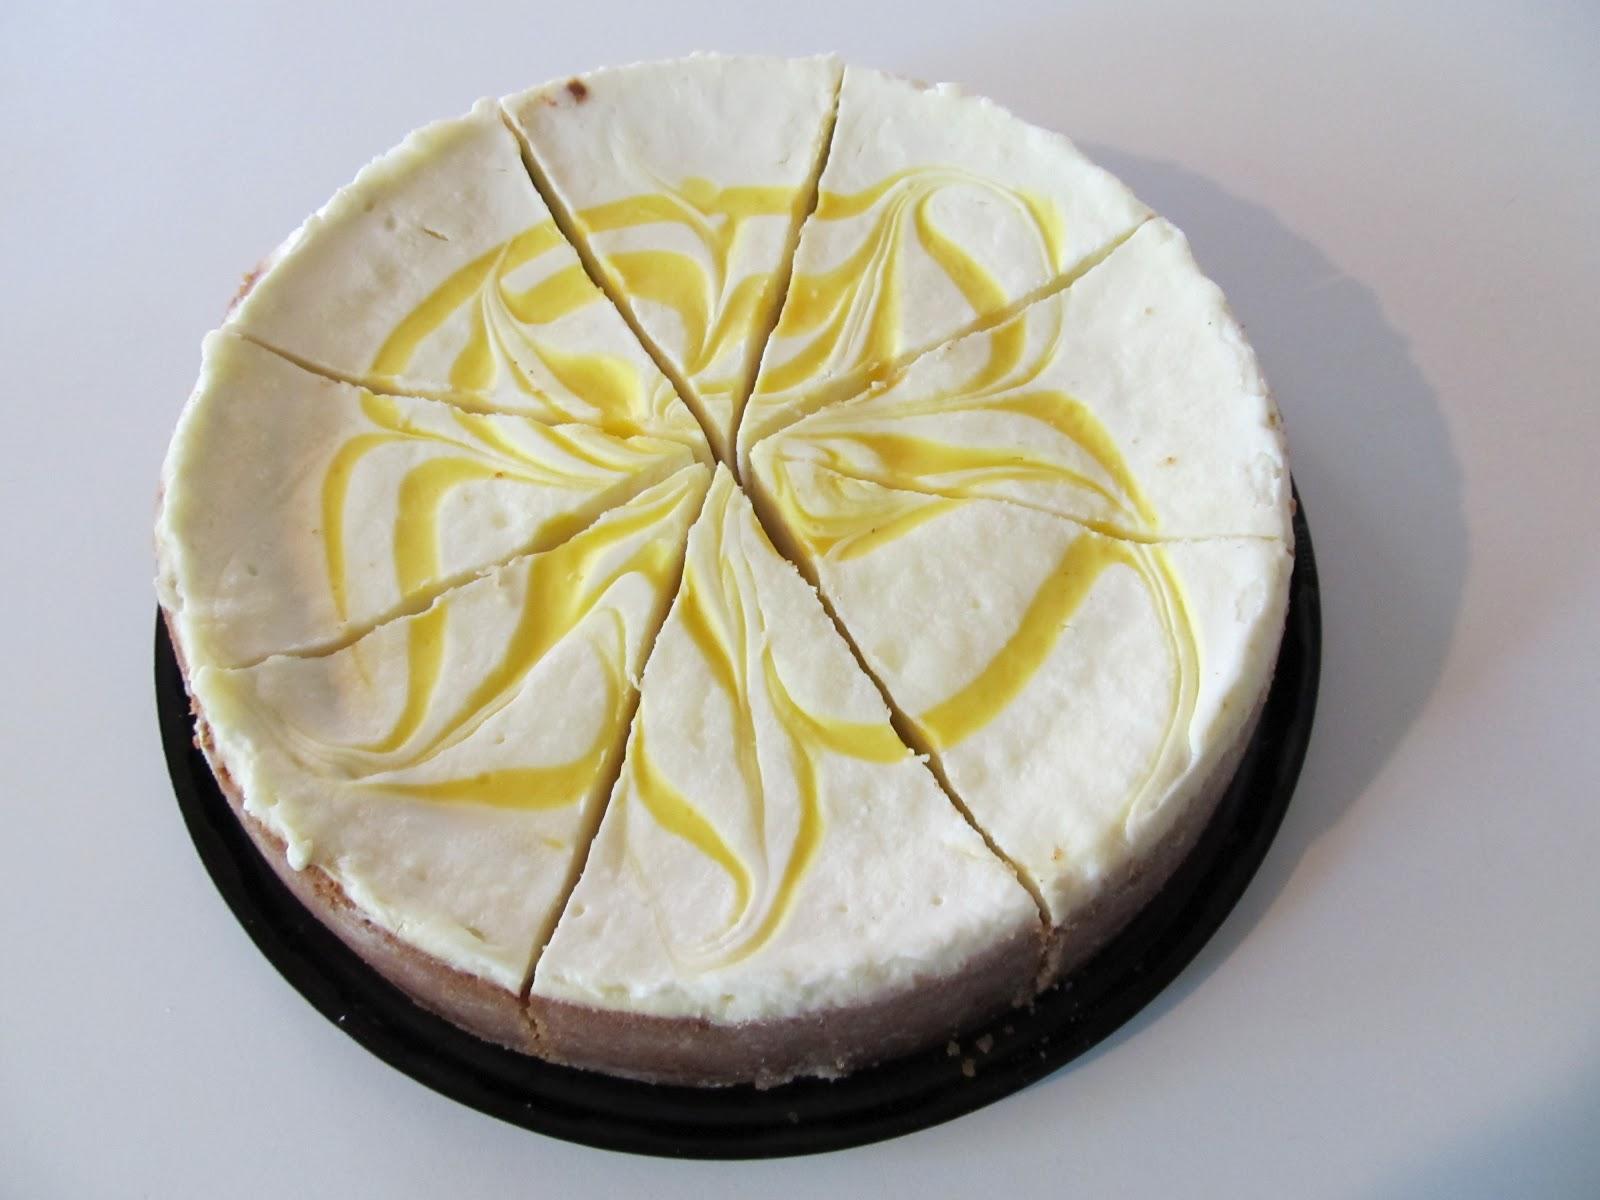 Frozen cake kroger myideasbedroom com